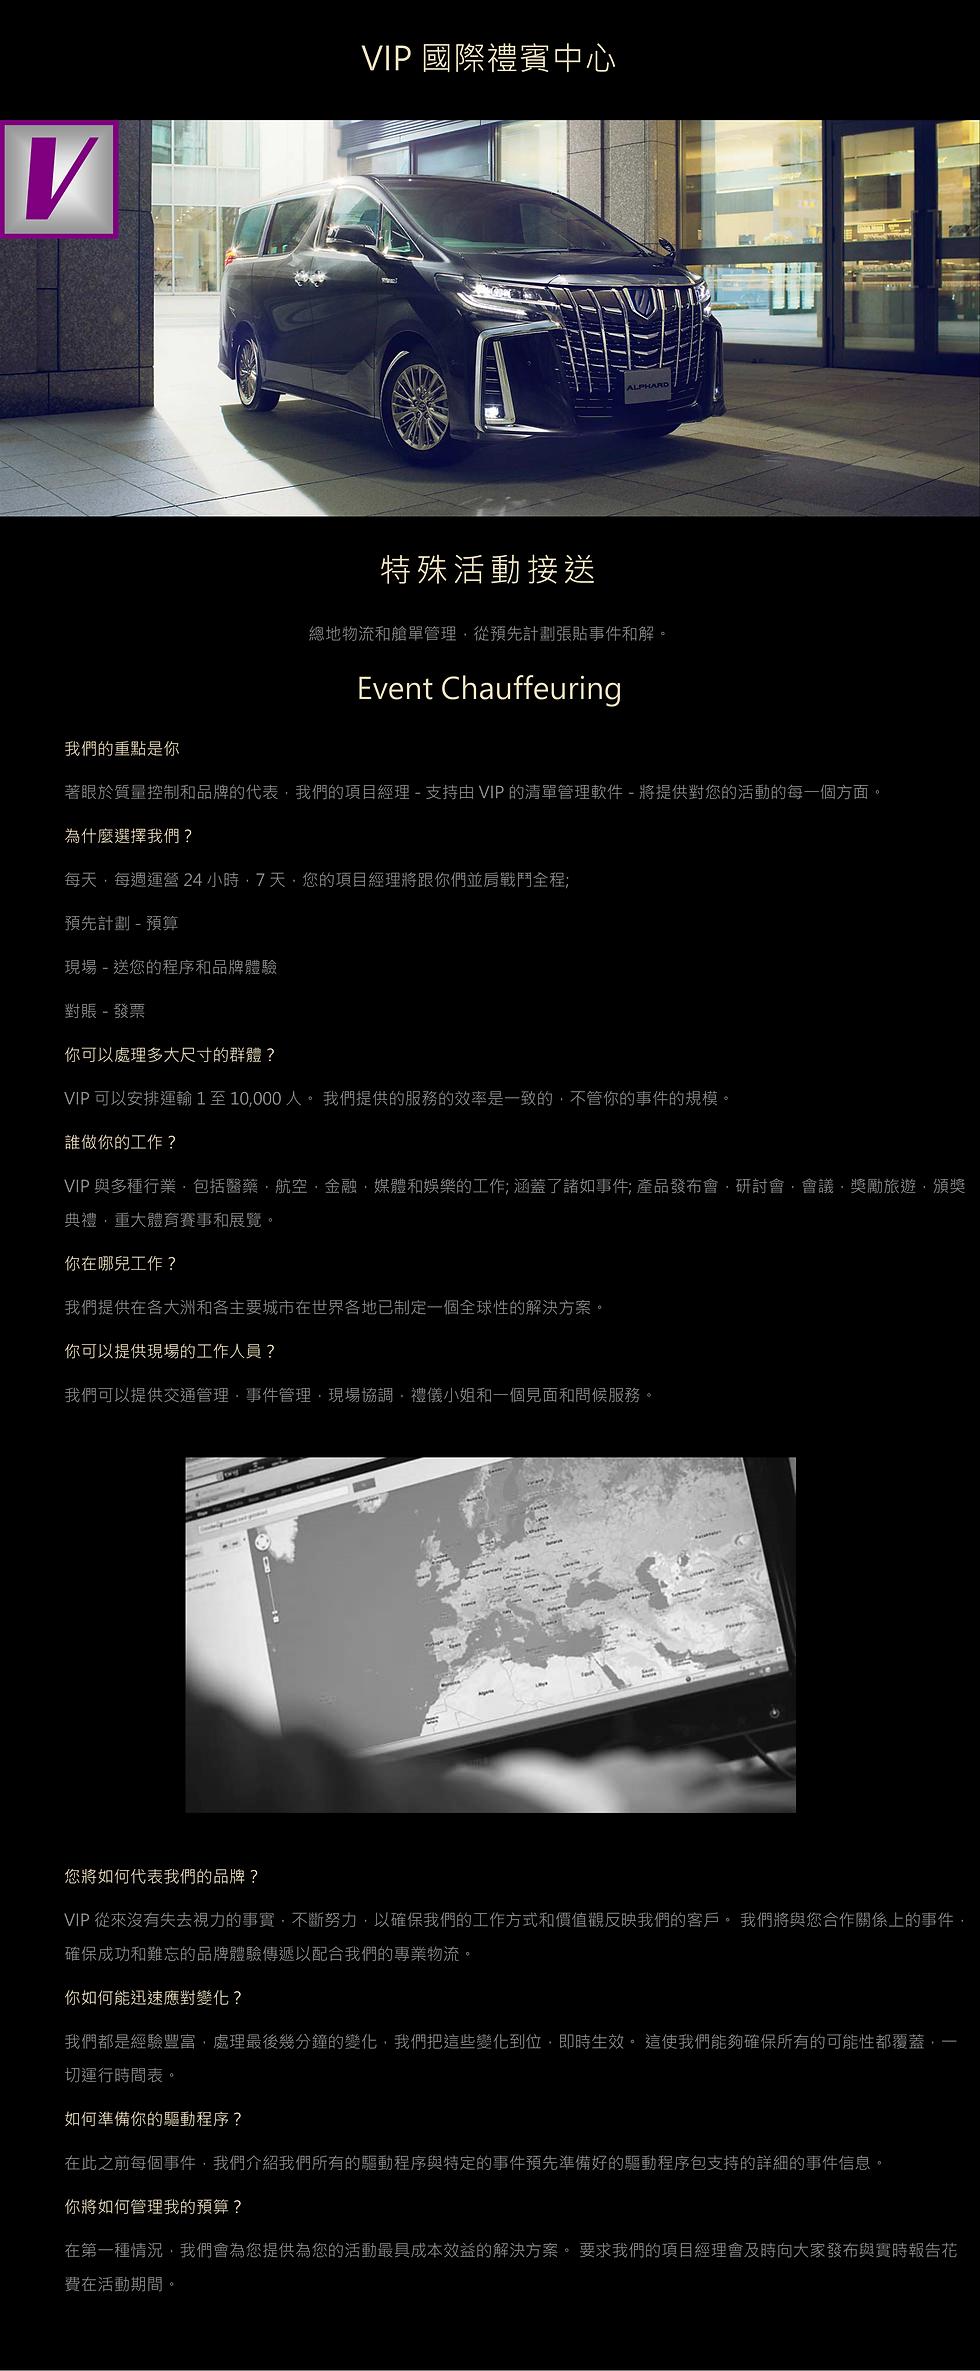 VIP國際禮賓中心 特殊活動接送.png